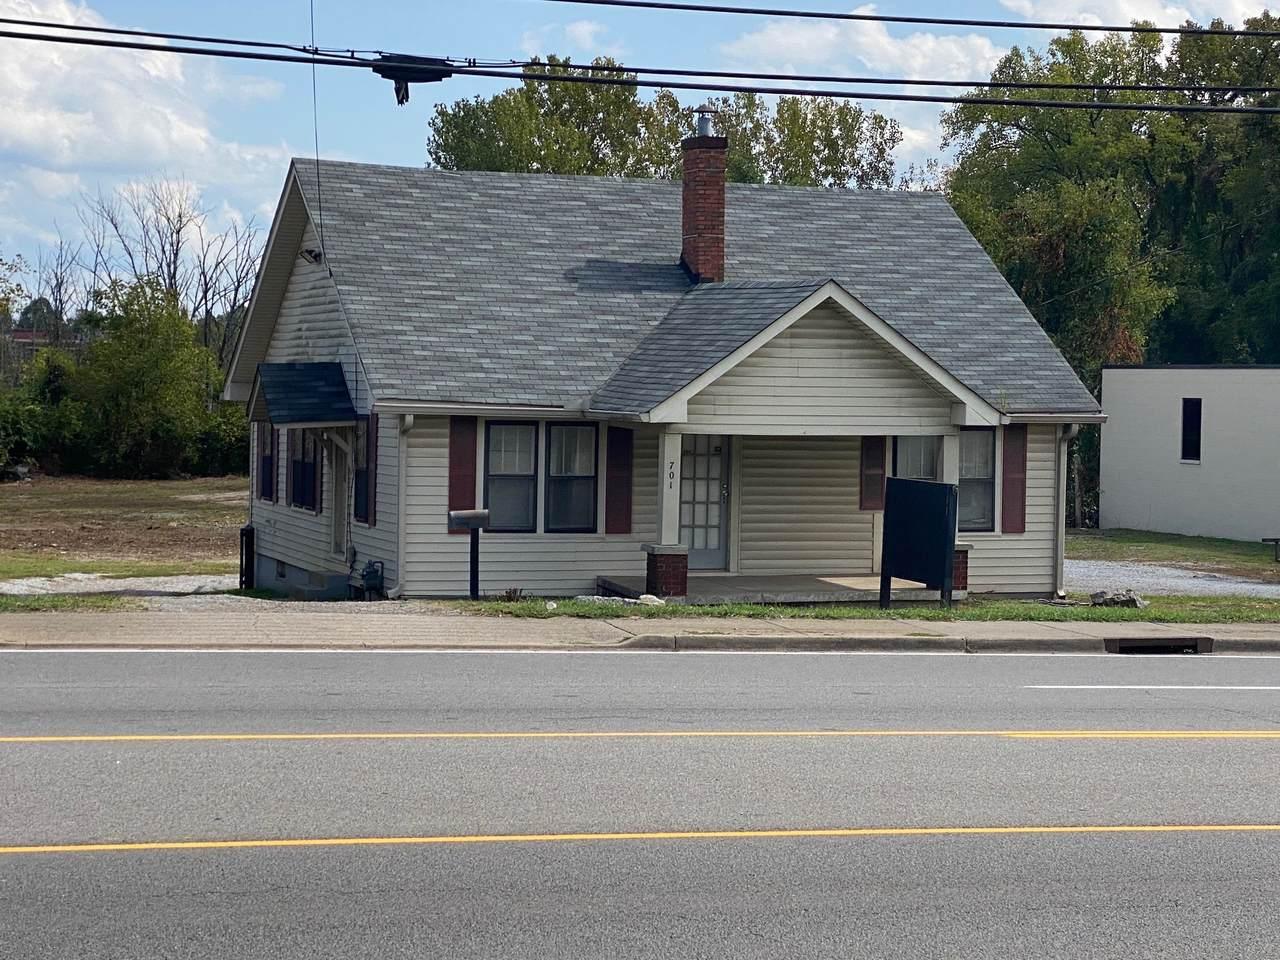 701 S Church St - Photo 1